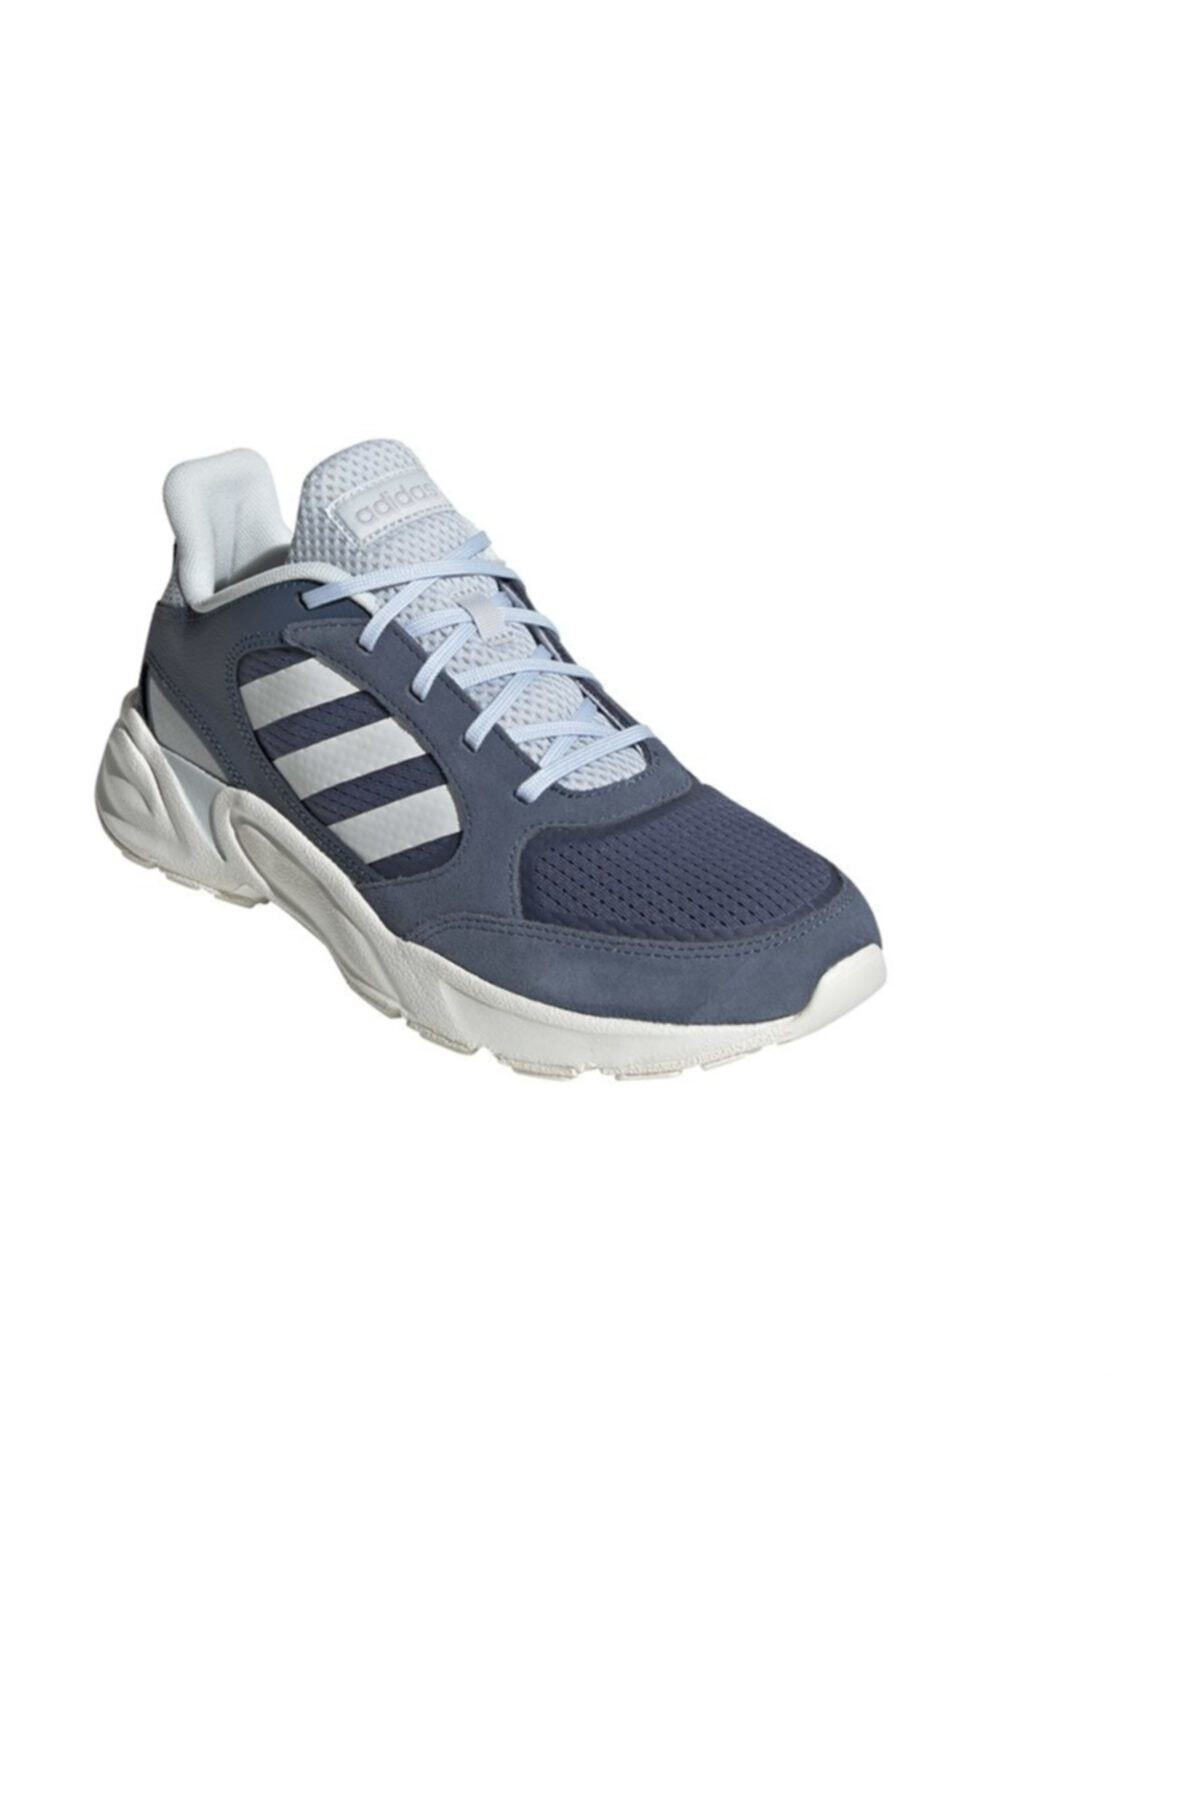 adidas Kadın Mavi Valasion Spor Ayakkabı 90s 1